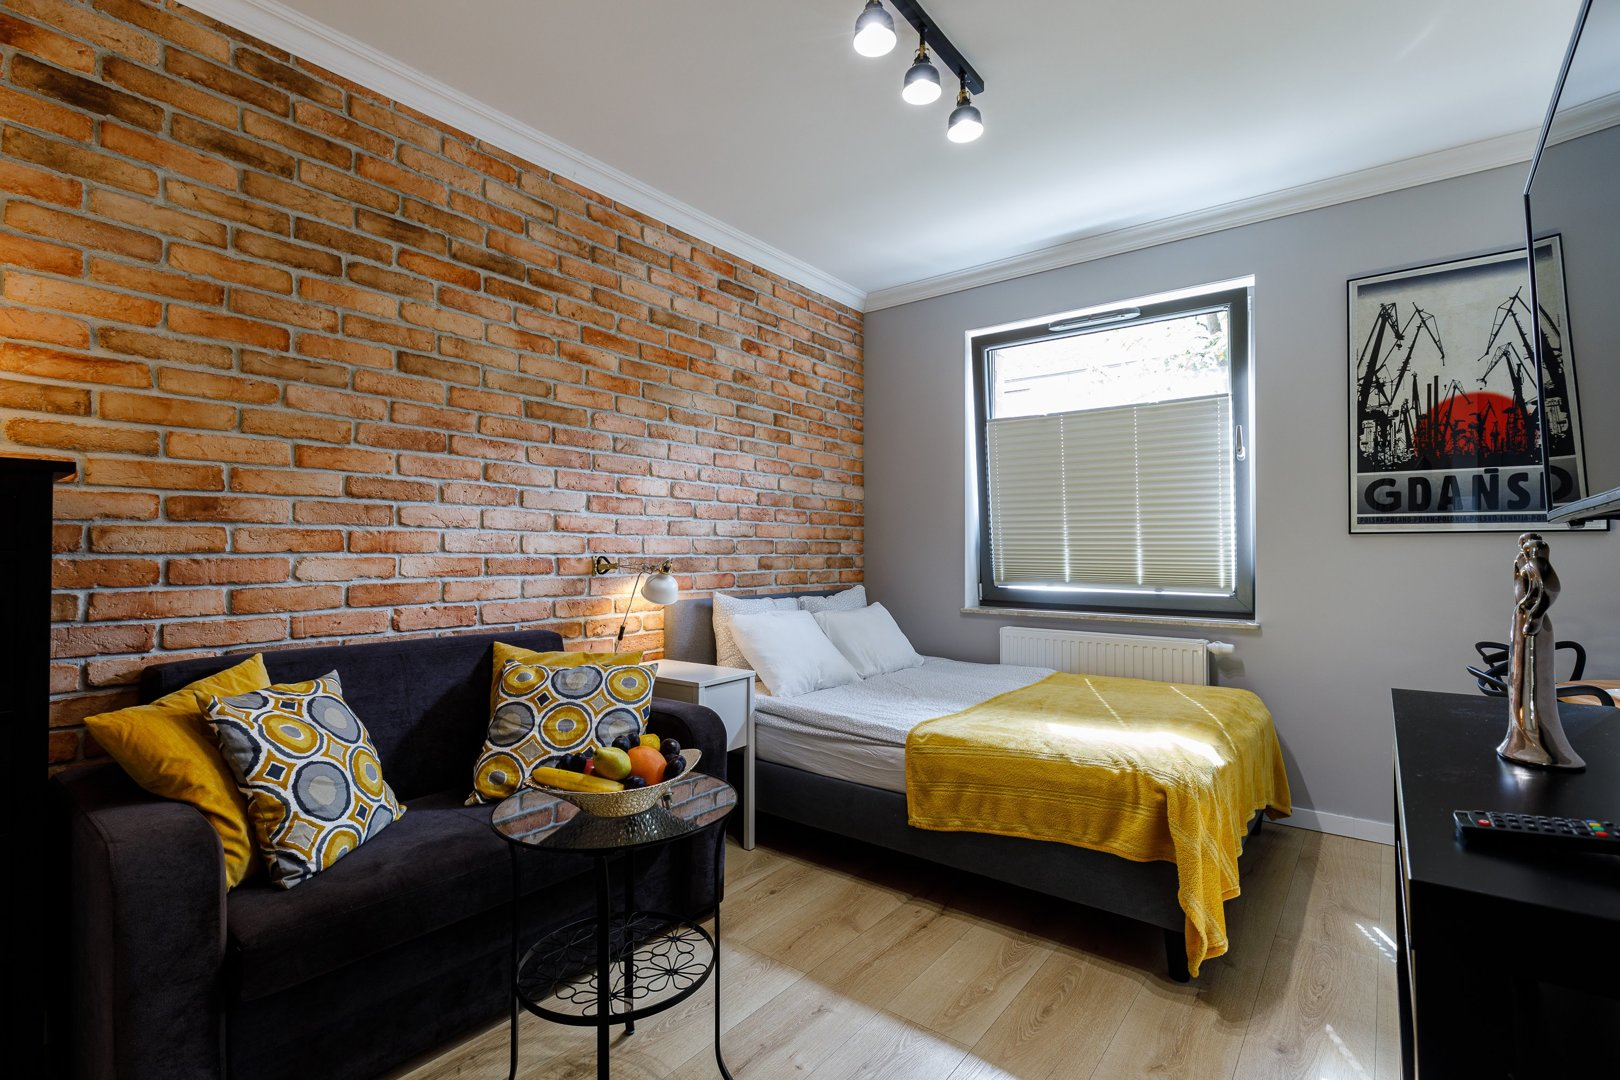 rezerwacje GDAŃSK Panieńska 3 mieszkanie nr 2A, 80-843 GDAŃSK